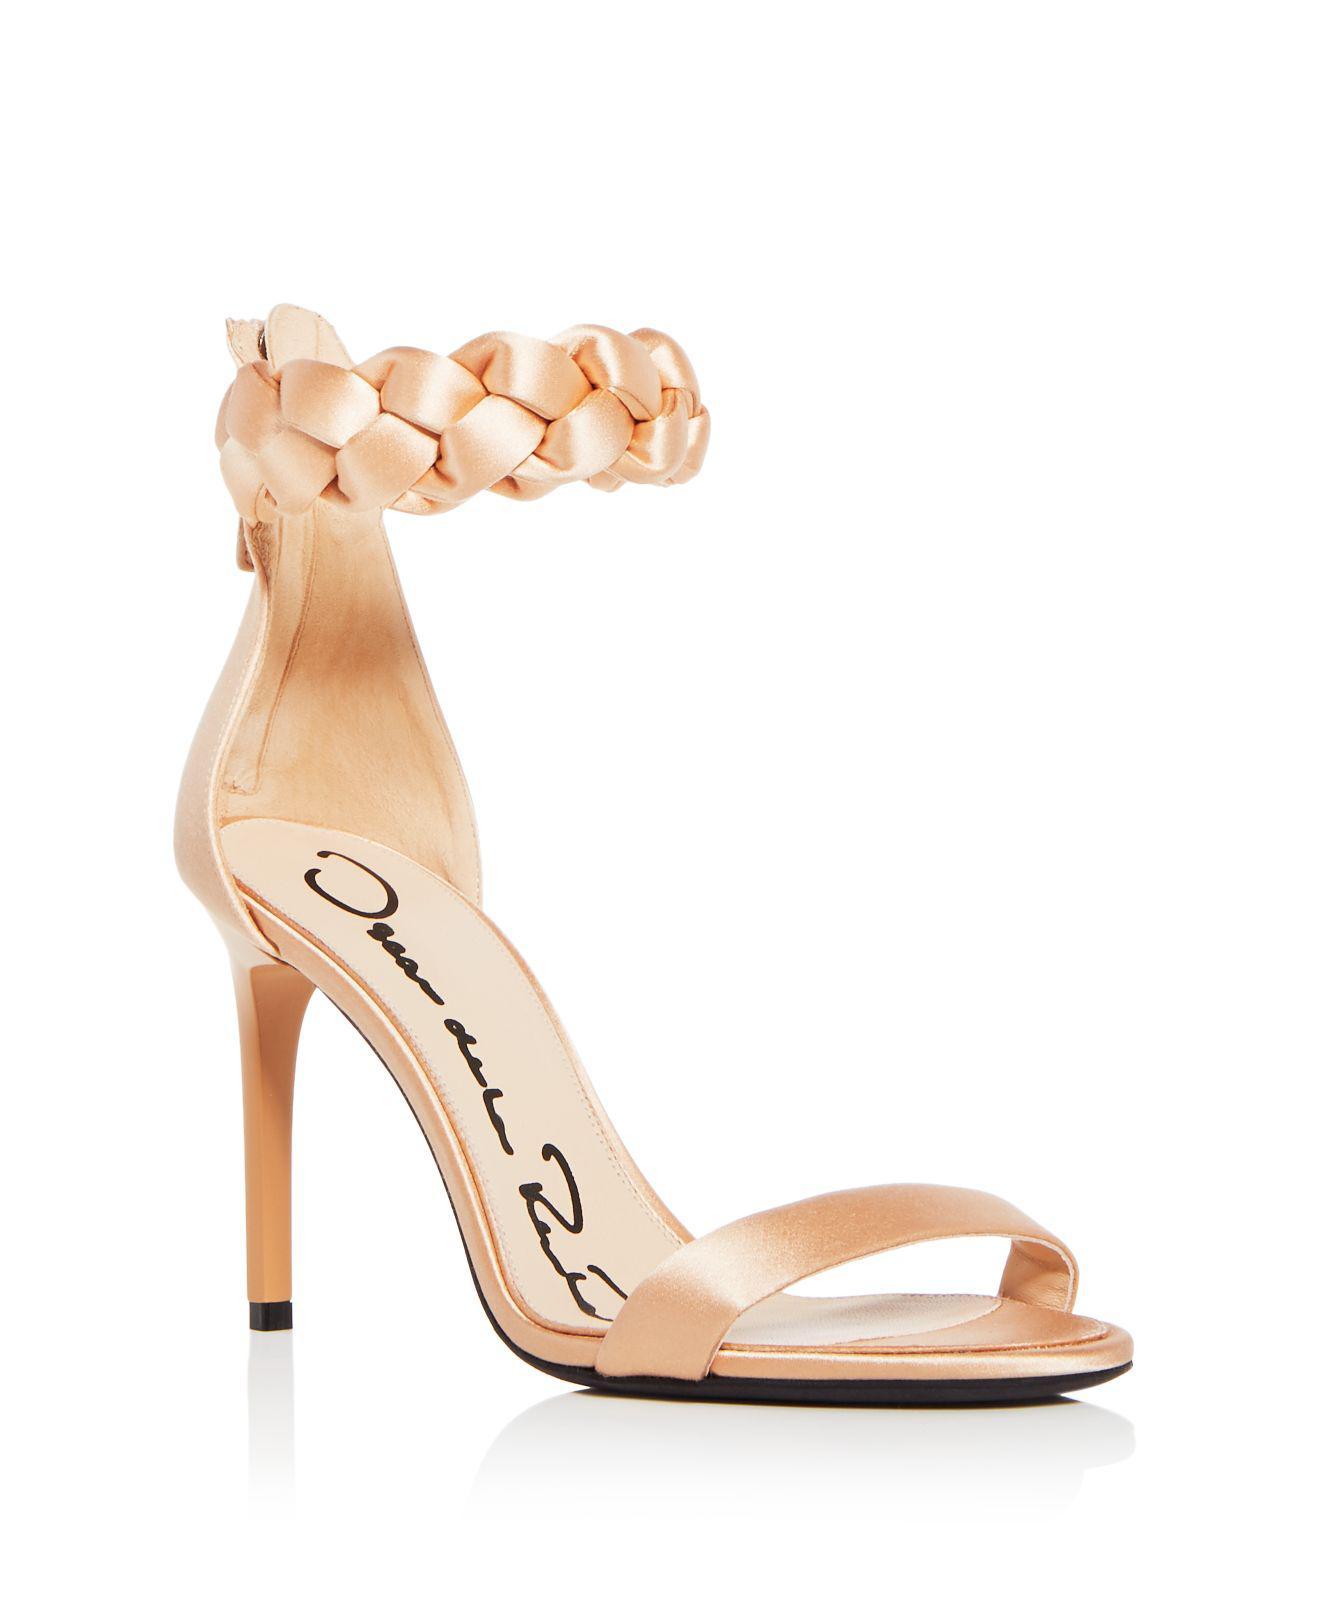 Oscar de la Renta Women's Brigit Braided Satin Ankle Strap High-Heel Sandals ereaRZ1a